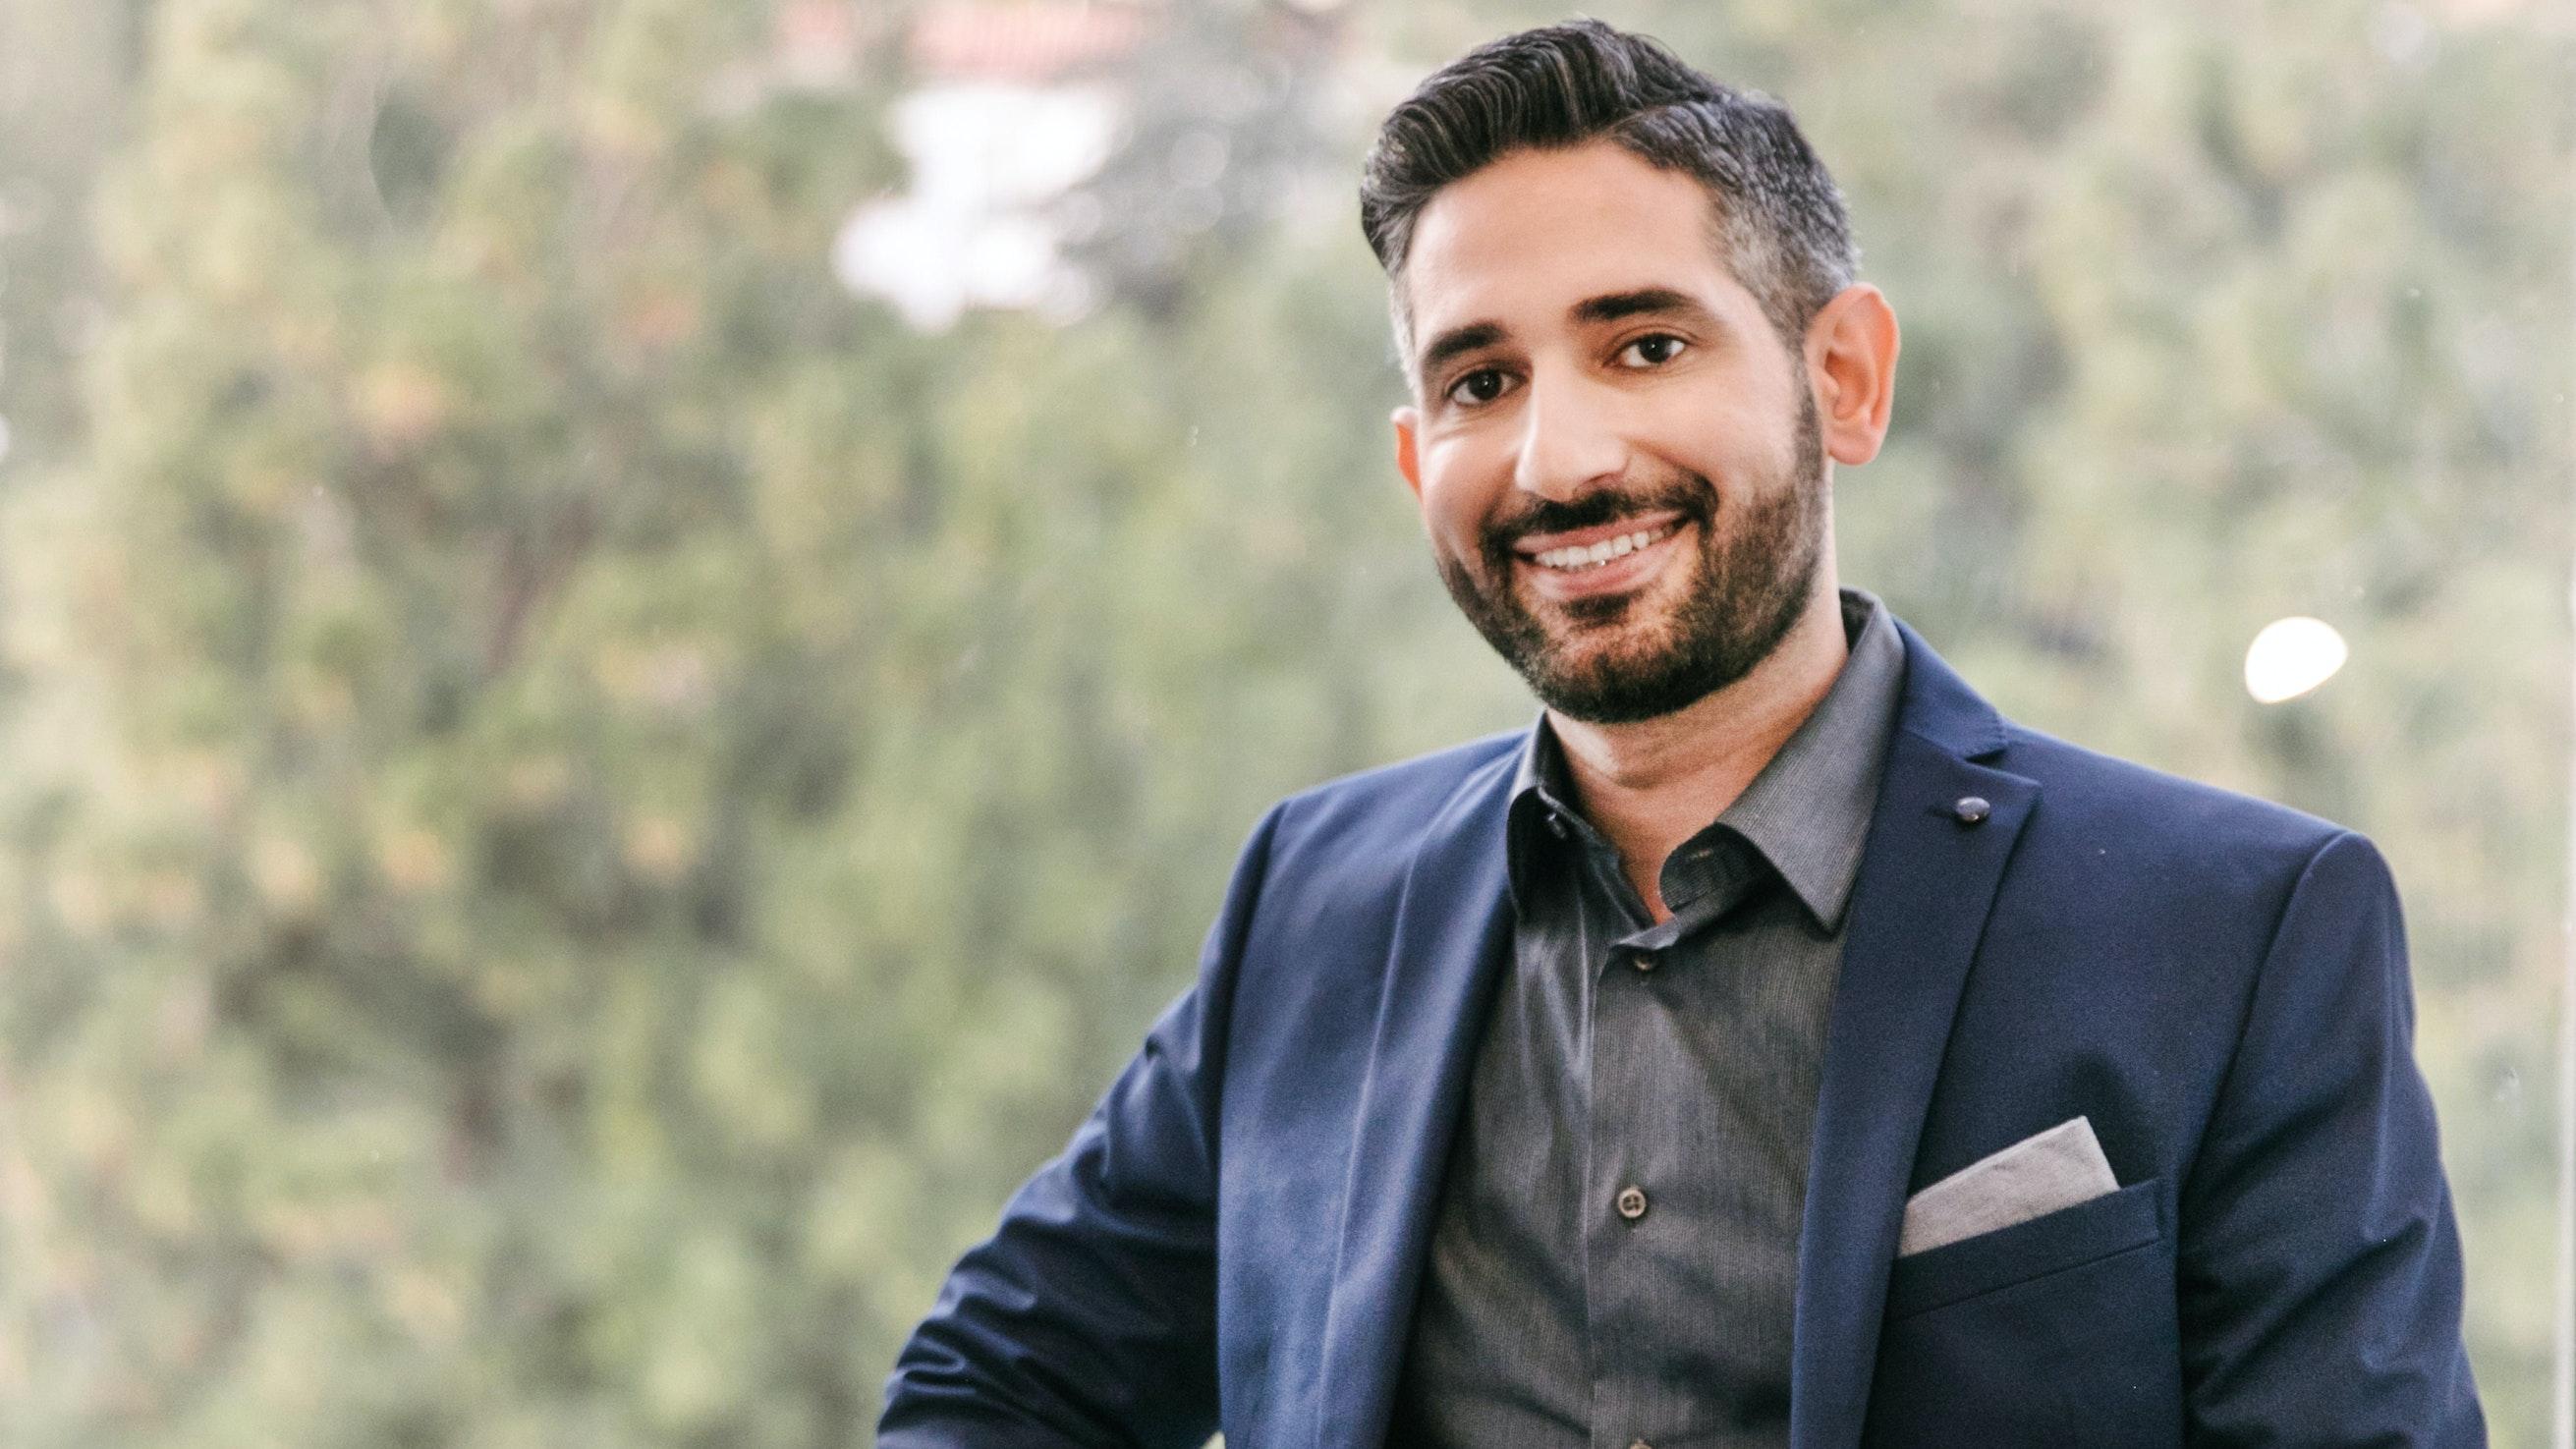 Hollywood Dentist Dr. Matt Nejad Talks Veneers, Injectables, and Eyebrow Grooming